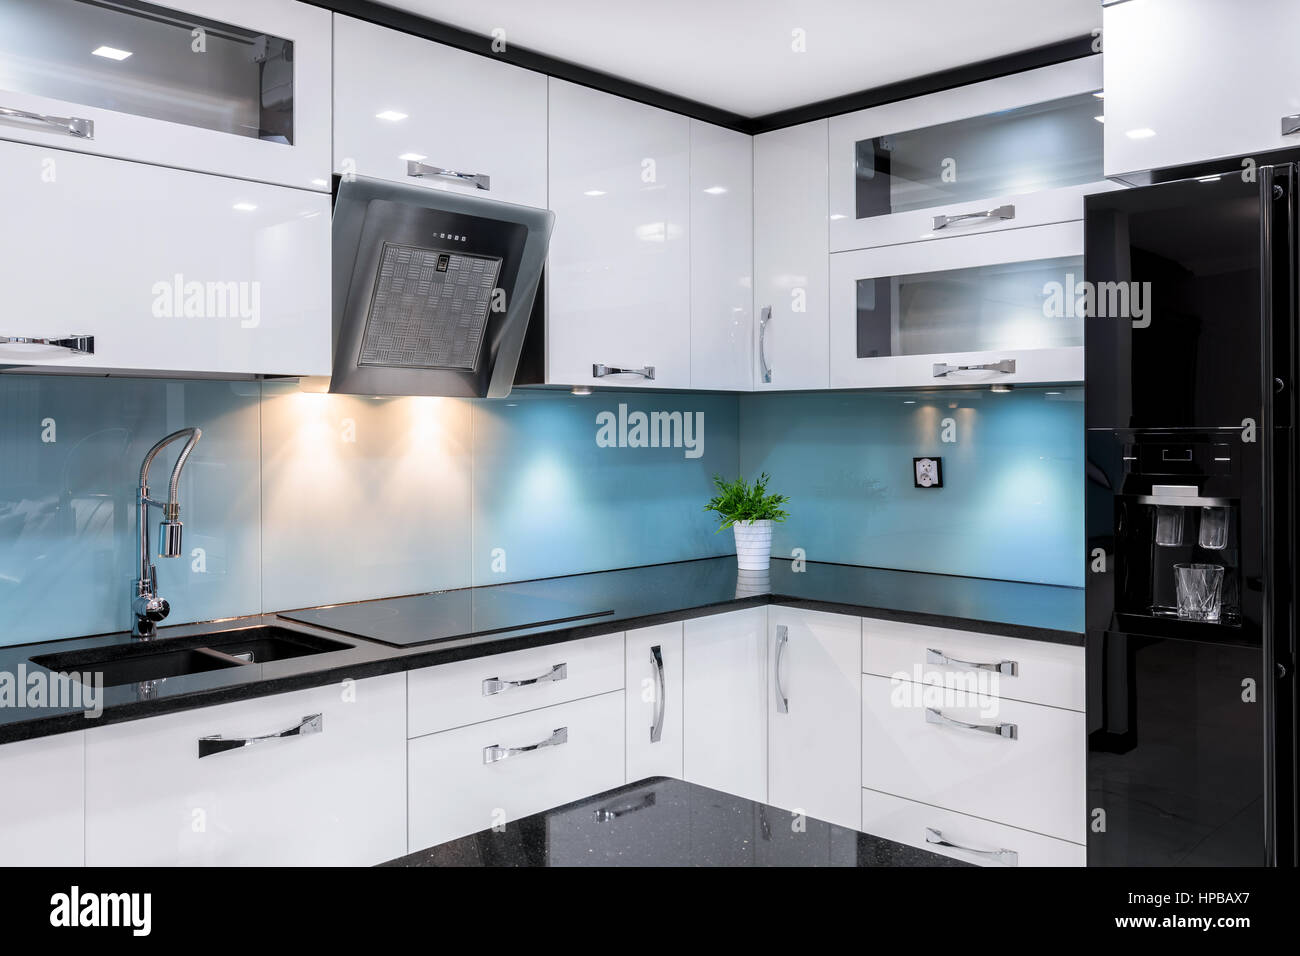 Luxury Kitchen With Modern Glossy Black Fridge And